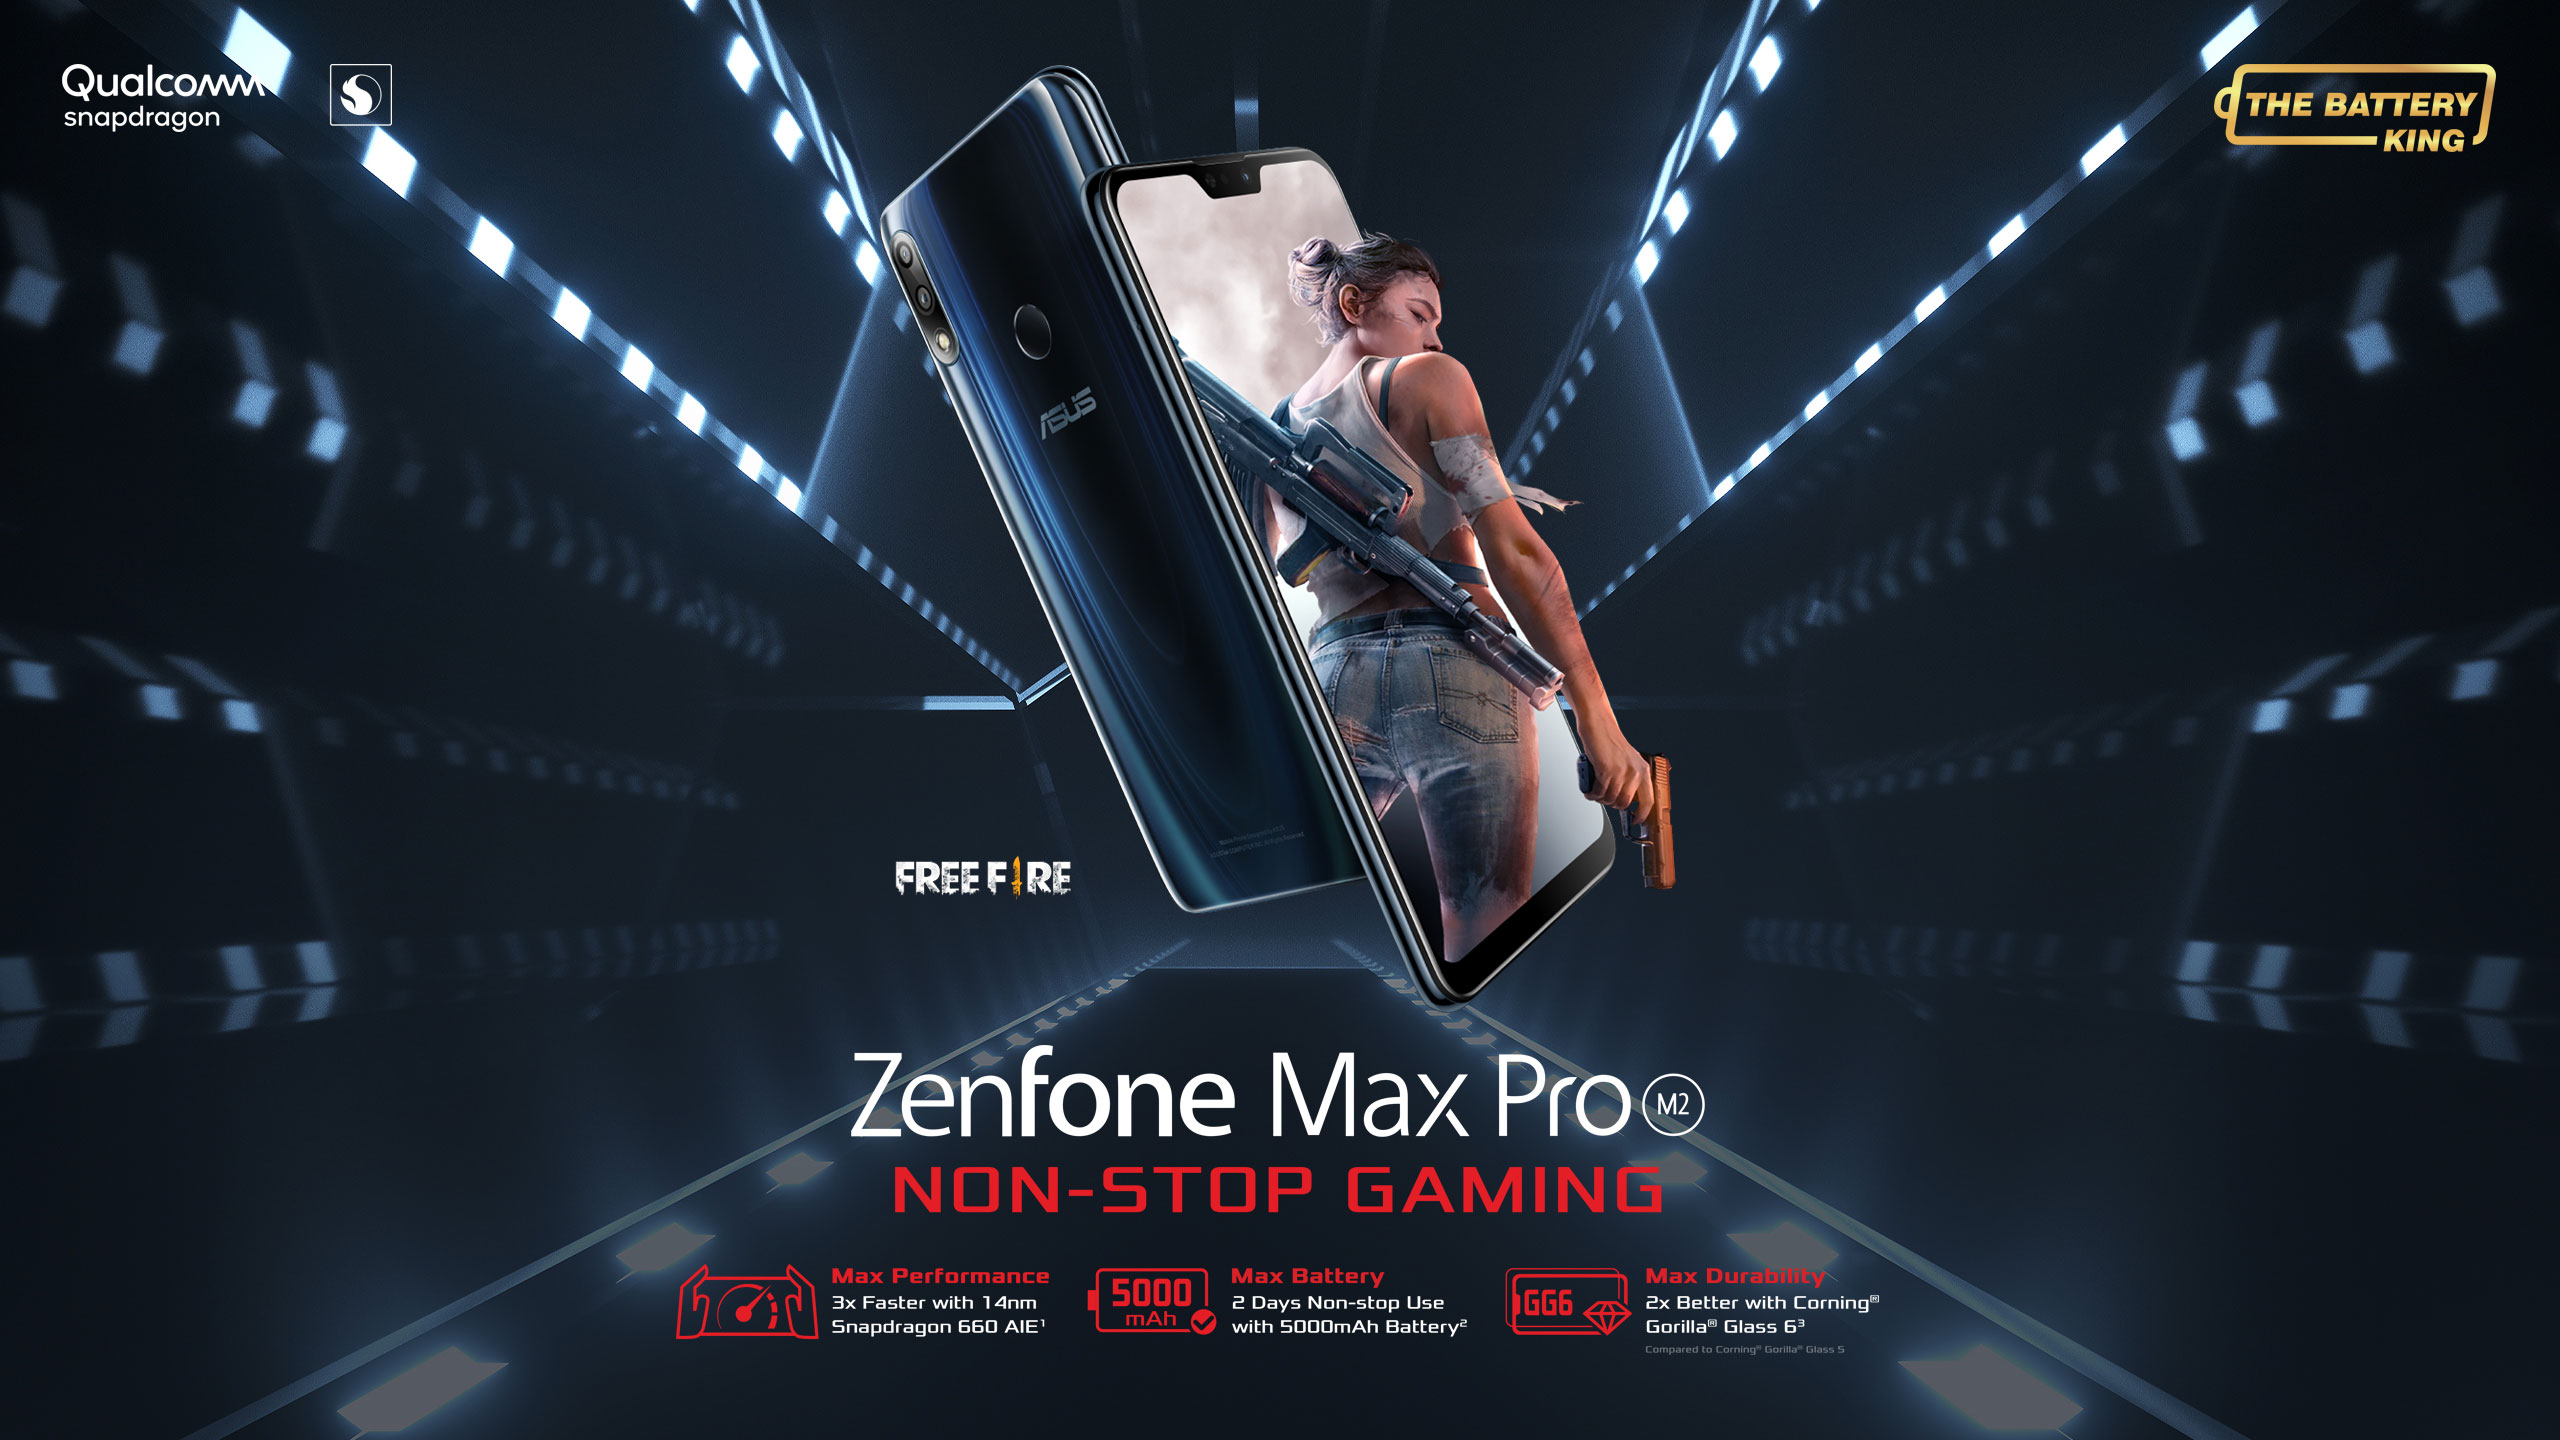 ZenFone Max Pro (M2) | Phone | ASUS Philippines